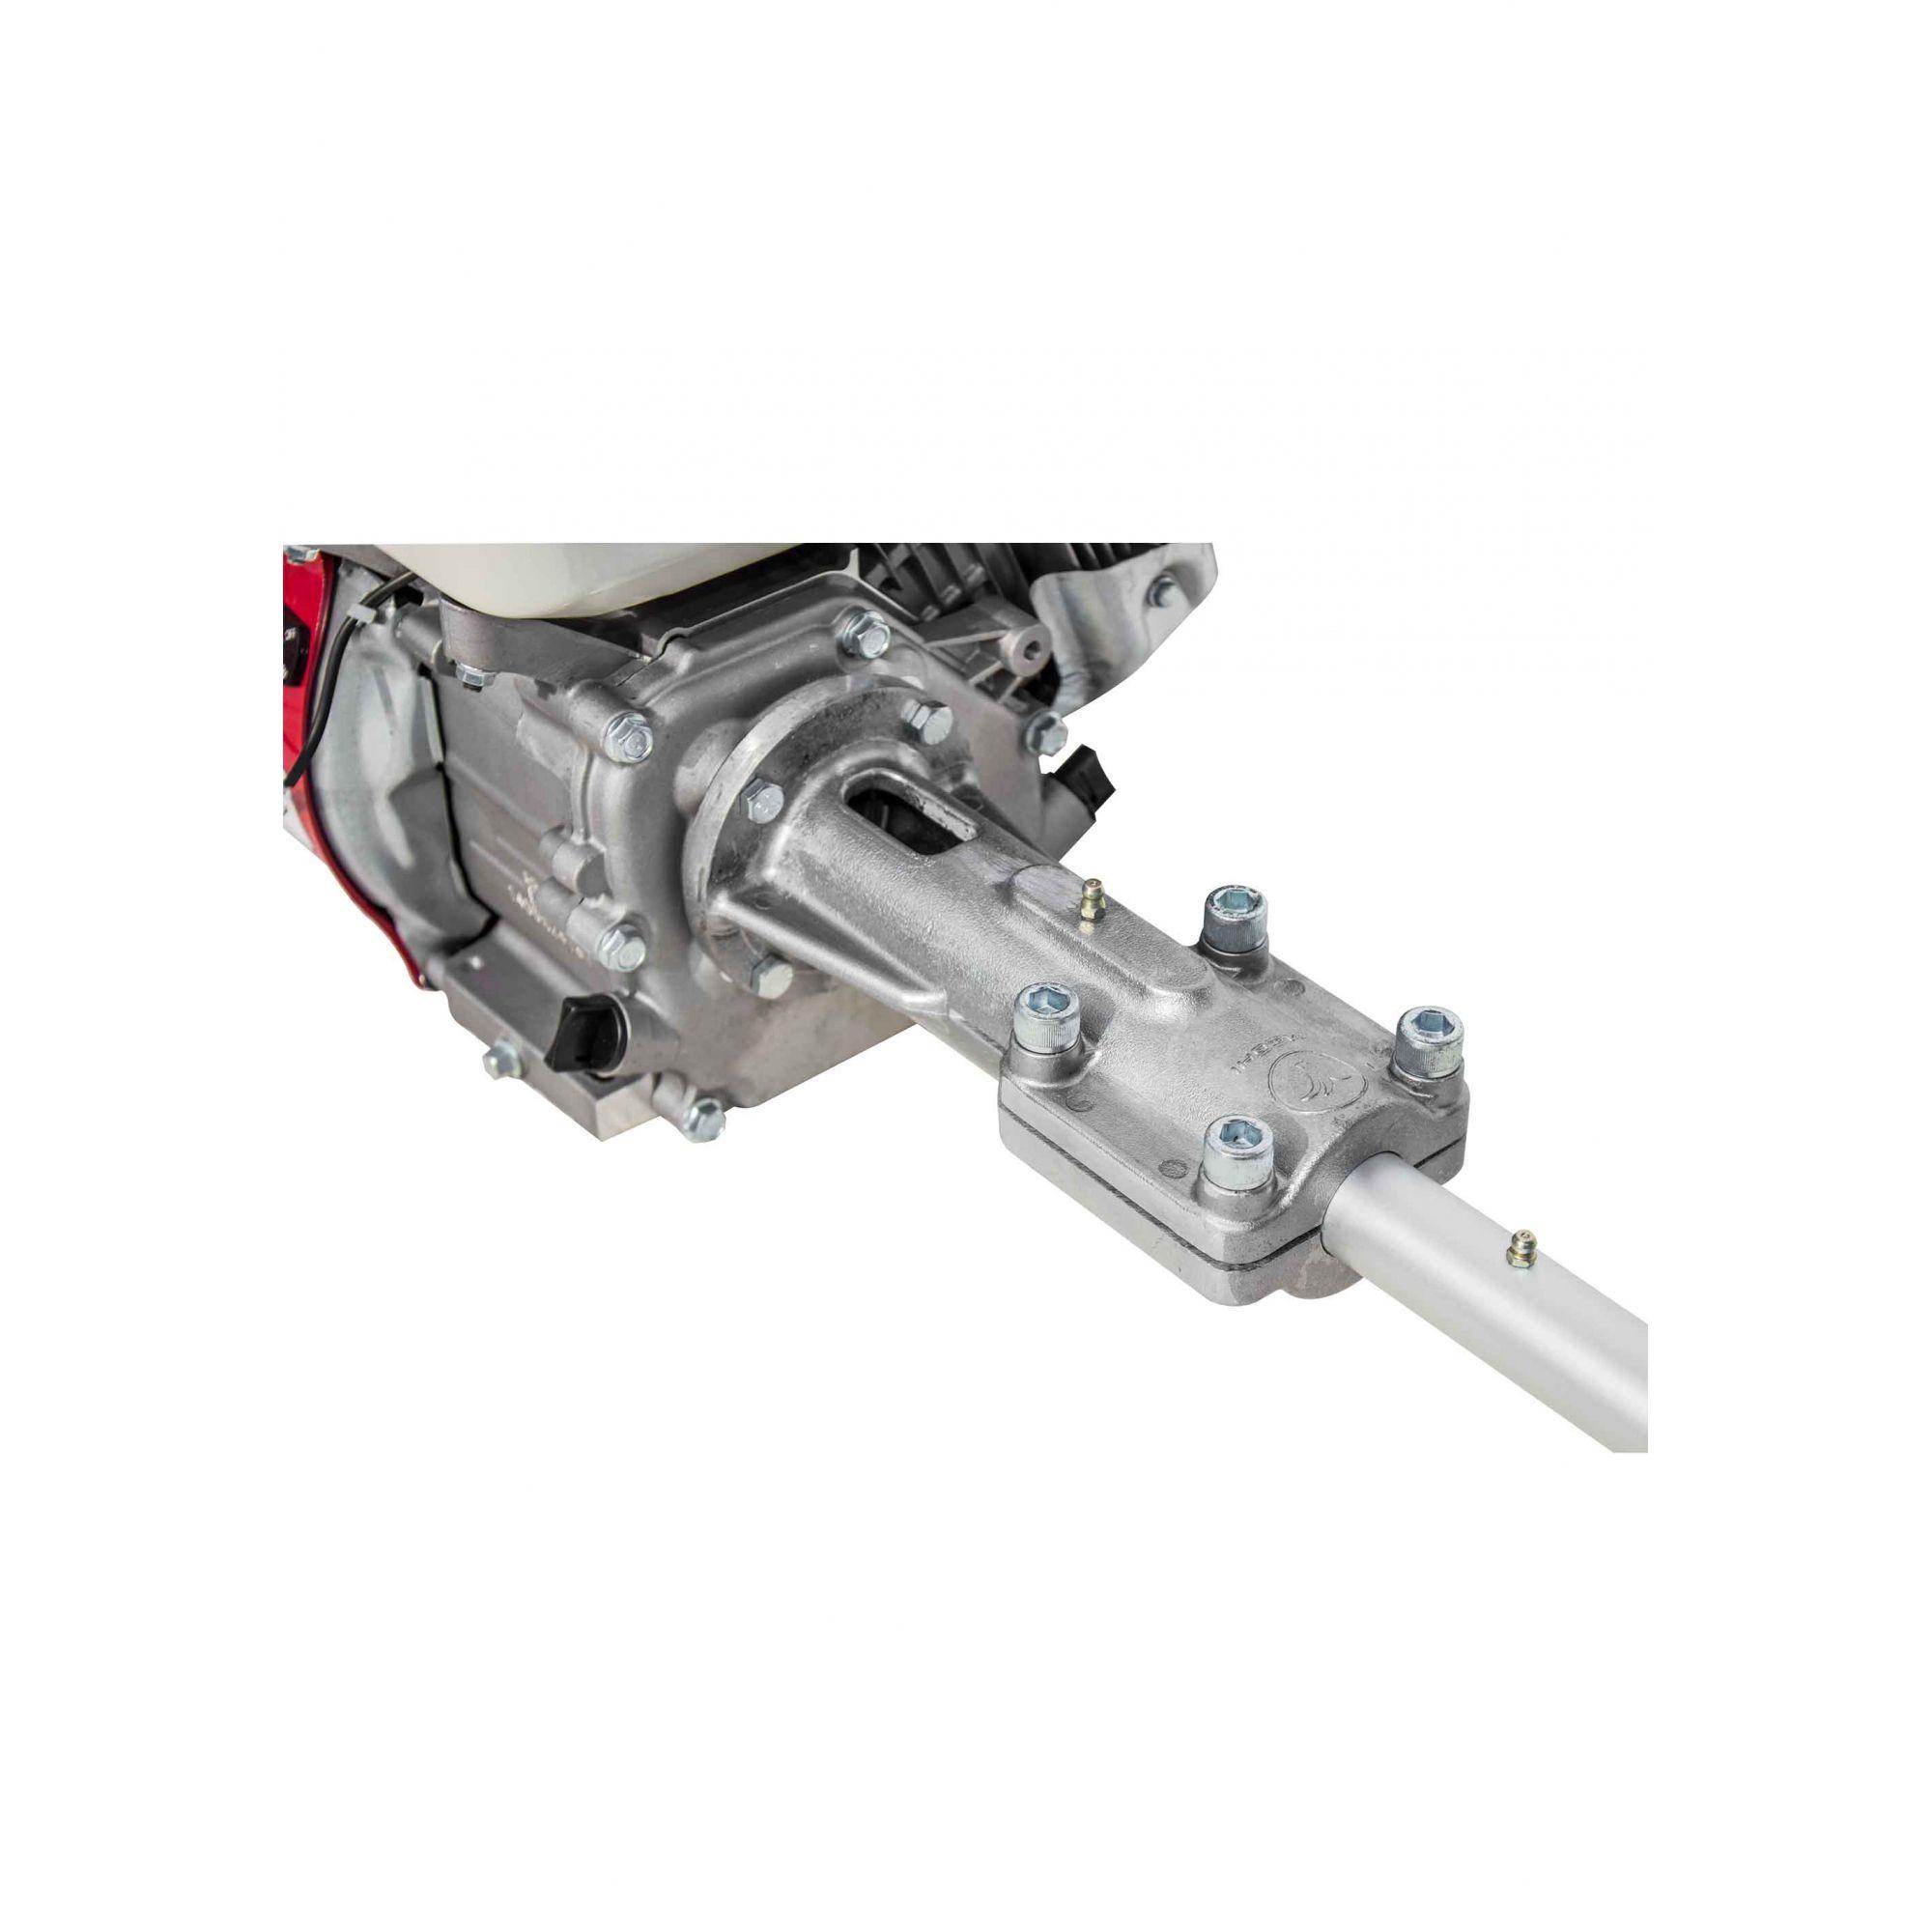 Kit Motor De Centro Barco Bote 2,20mt Motor 7 Die 08/09 Gaso